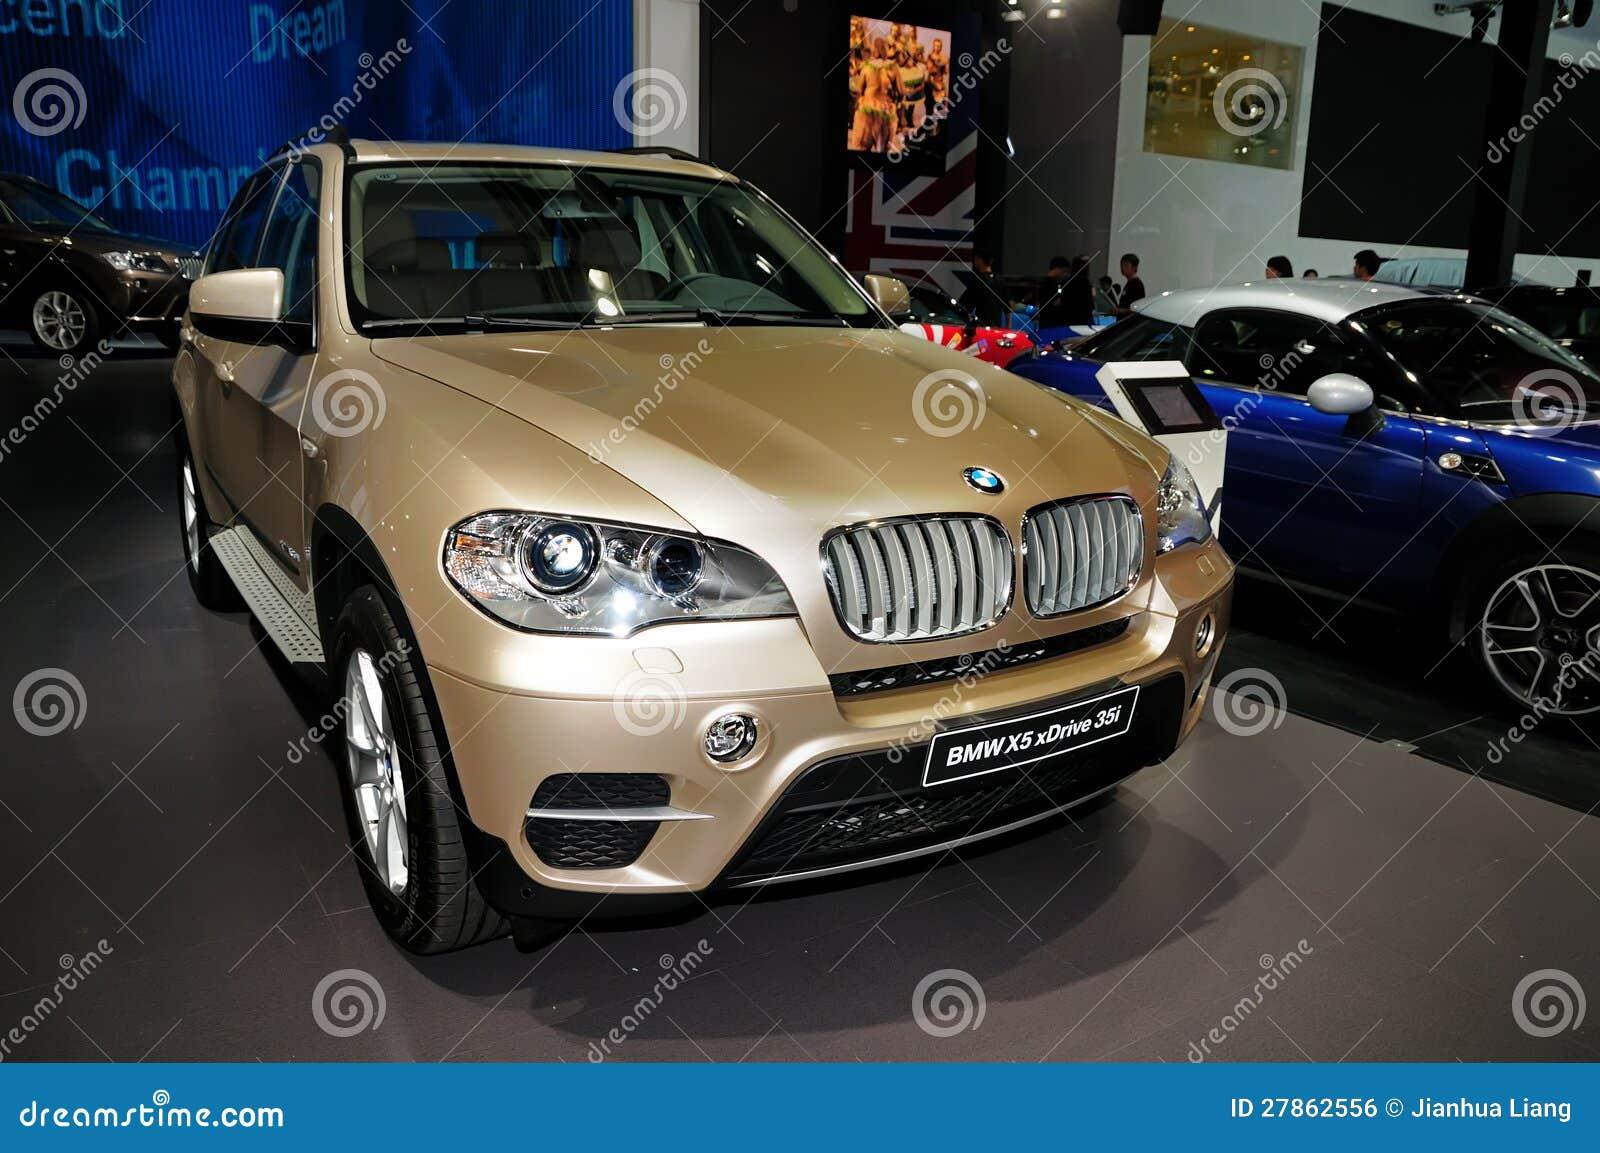 BMW X5 xDrive 35i SUV